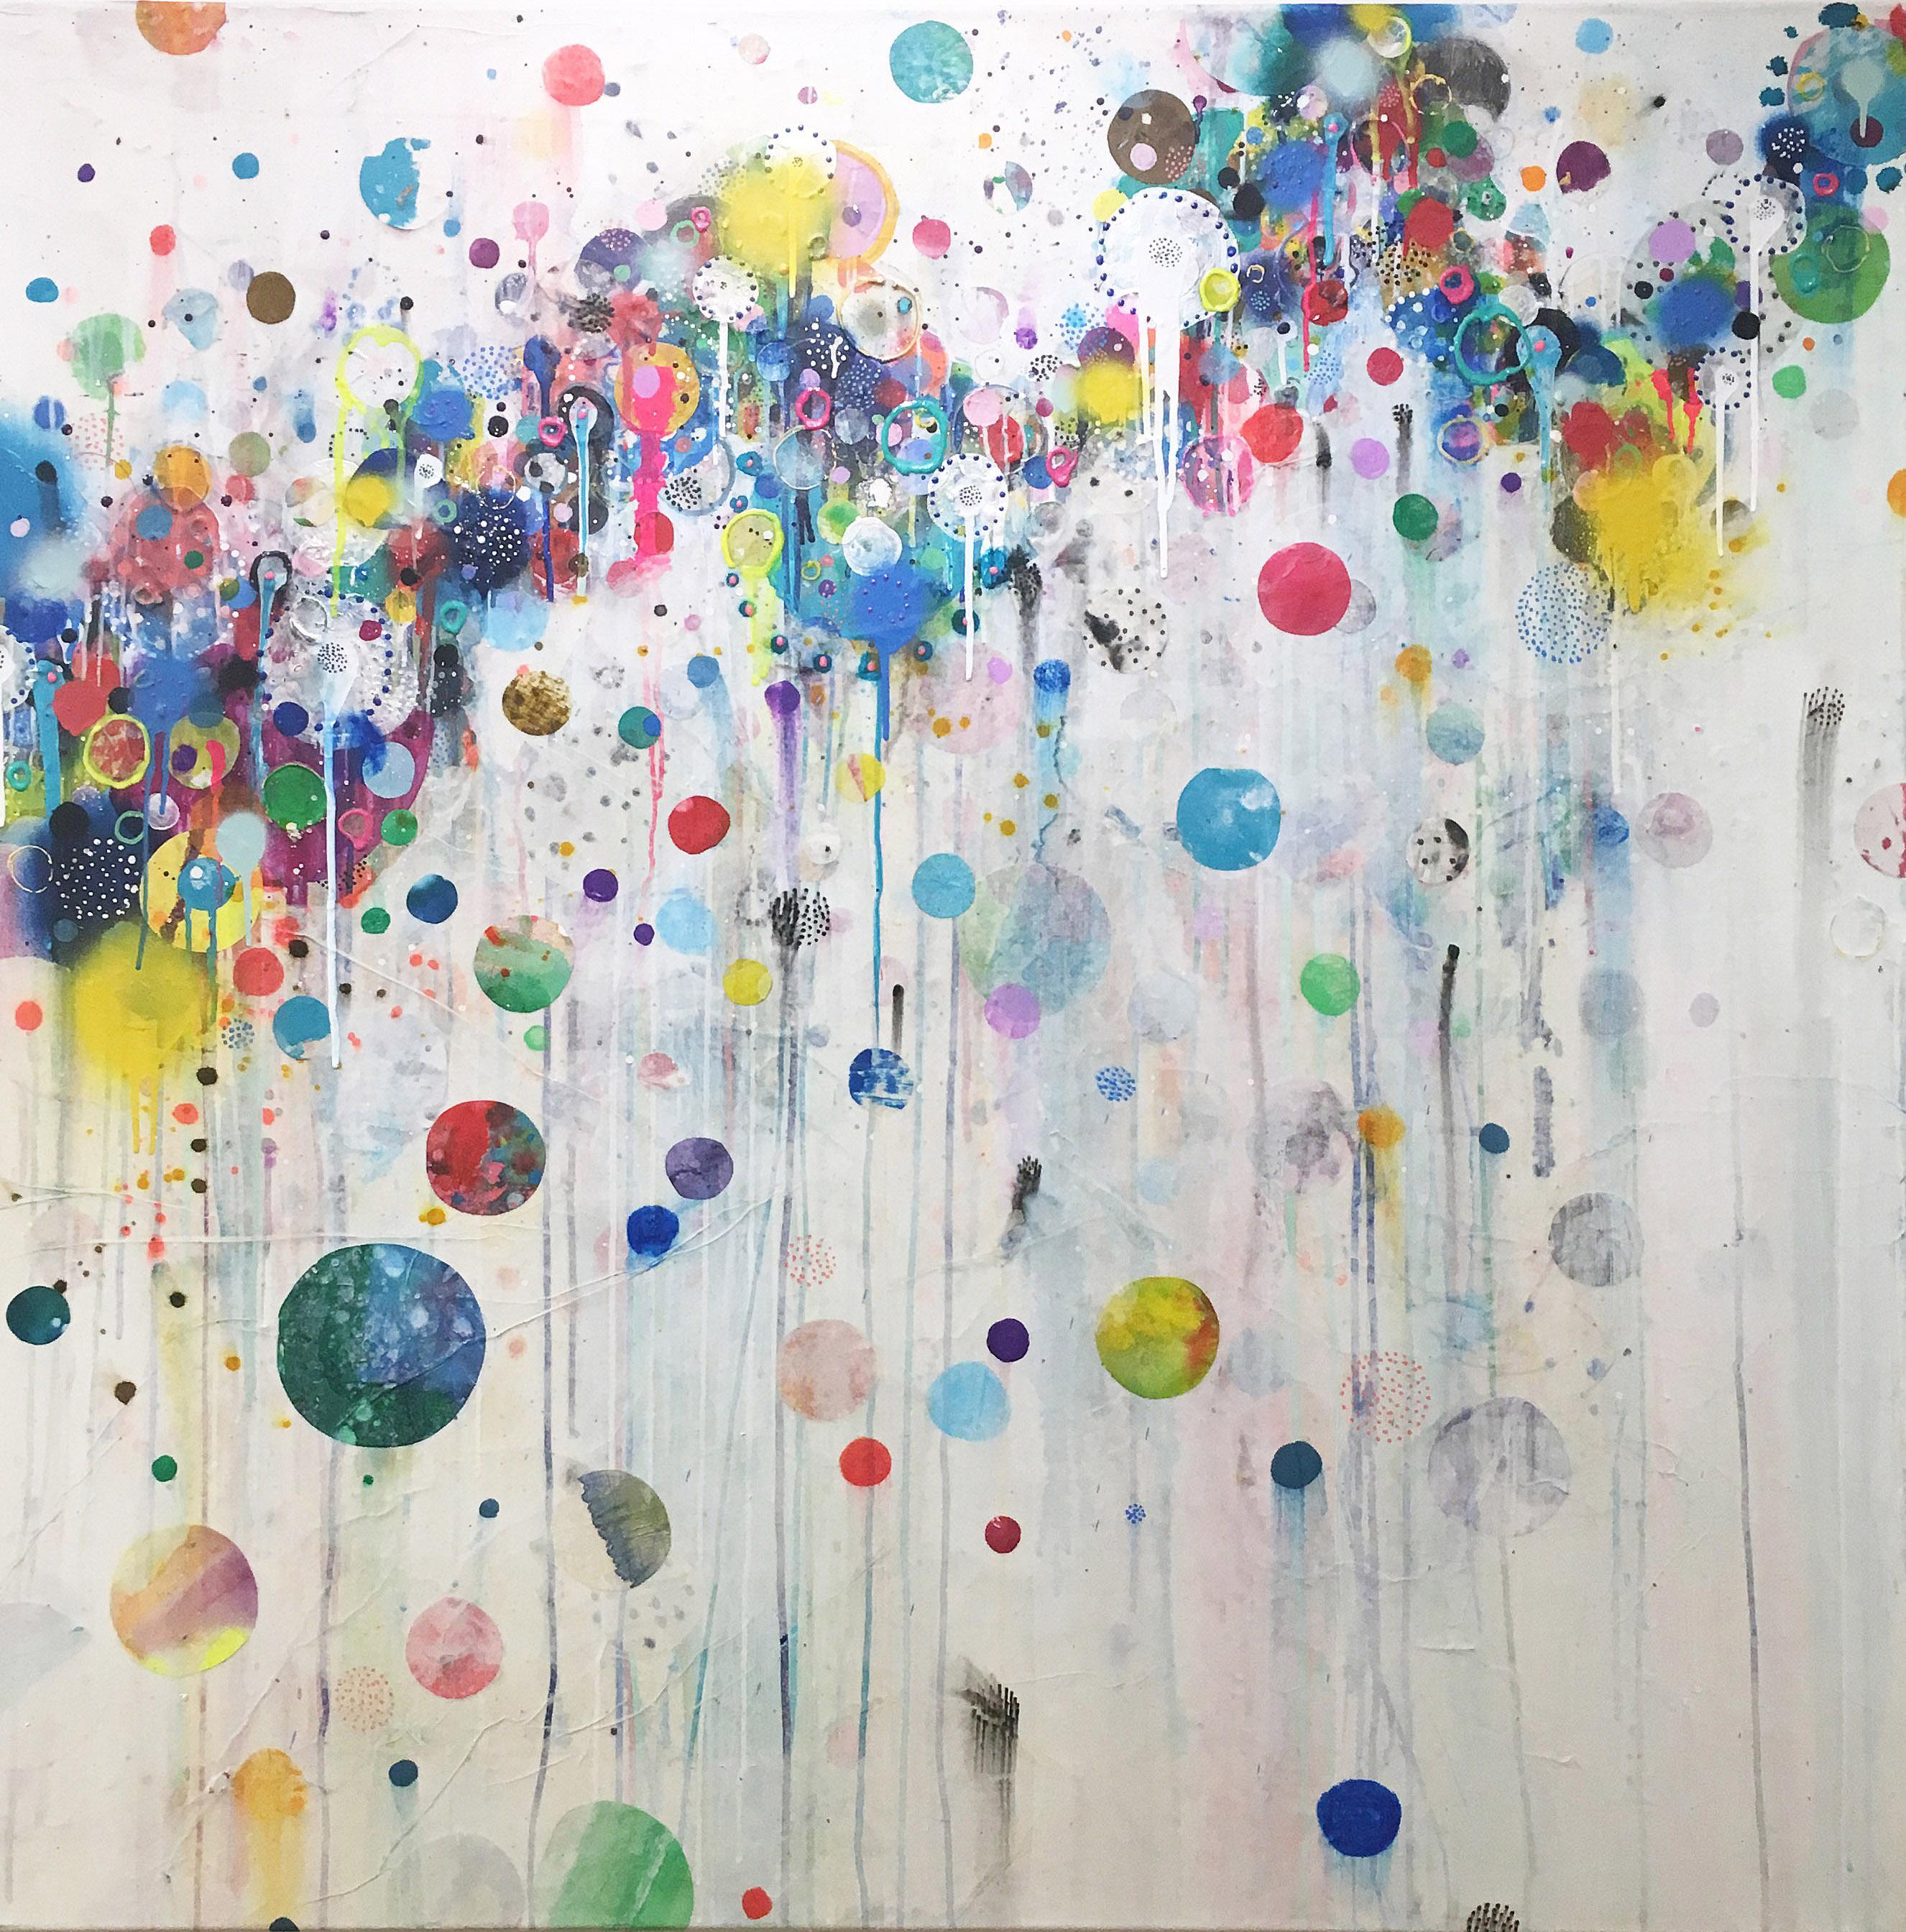 Colorful, Abstract painting, Liz Tran, Nico